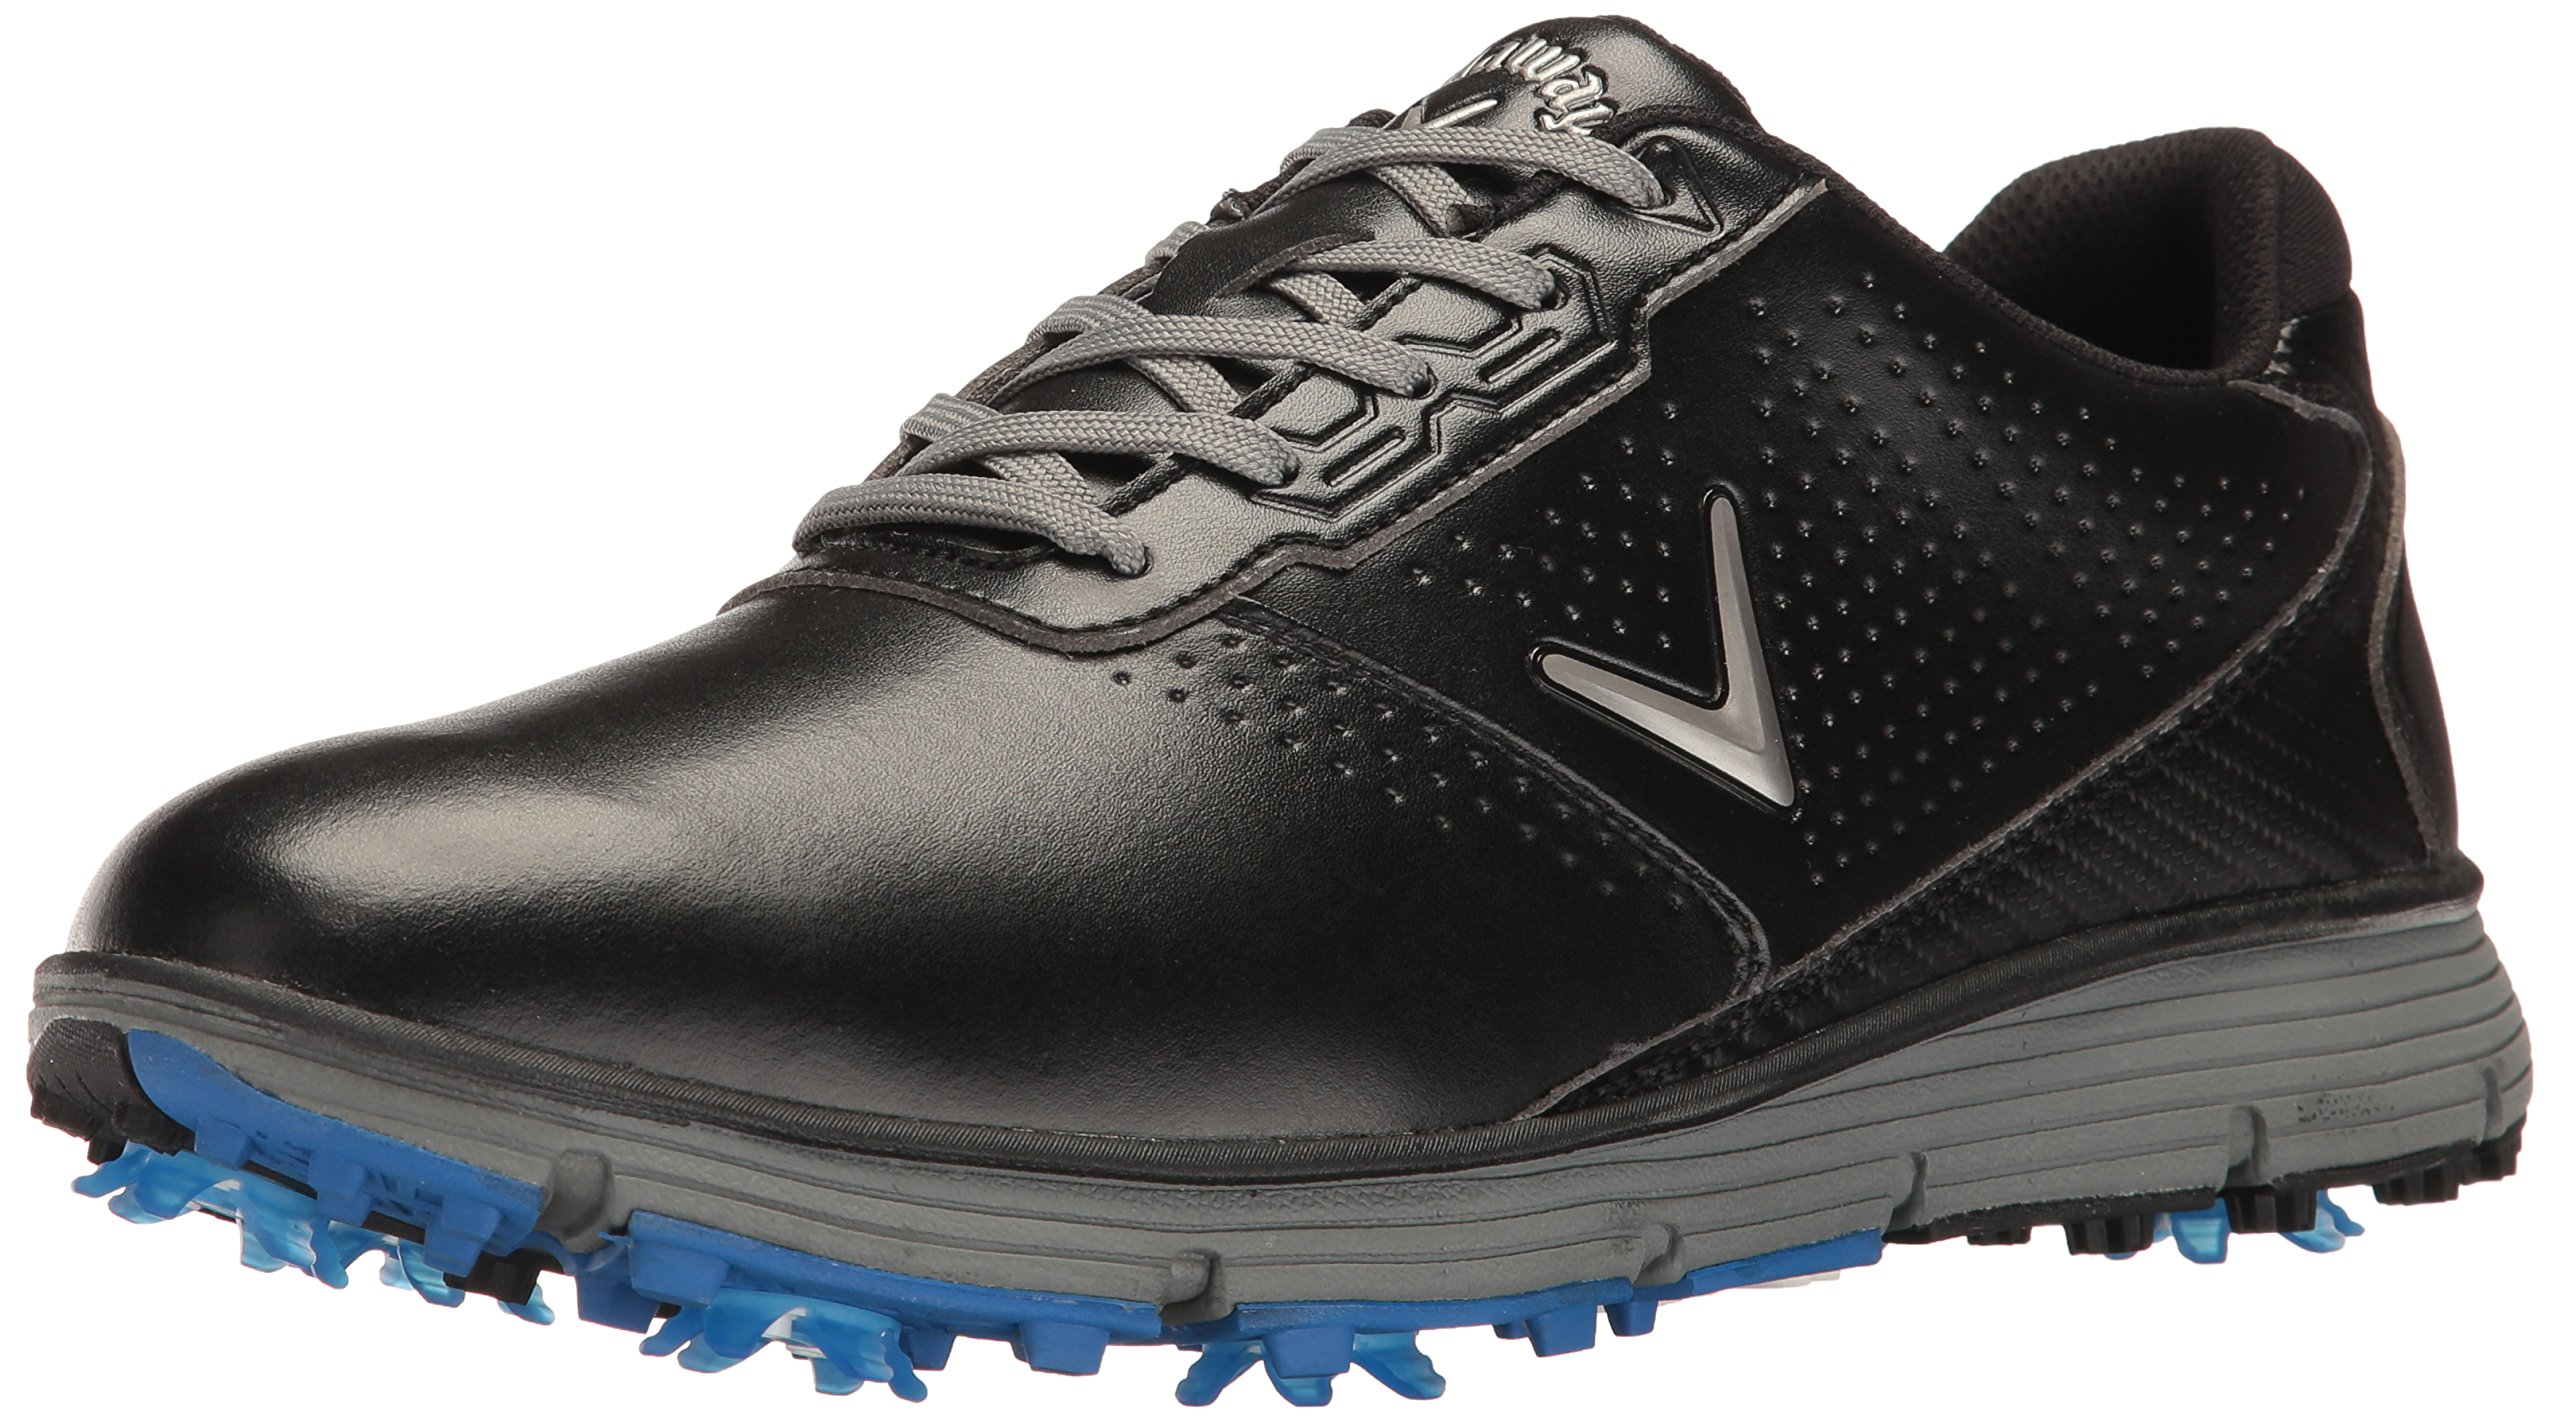 Callaway Men's Balboa TRX Golf Shoe, Black/Grey, 9 D US by Callaway